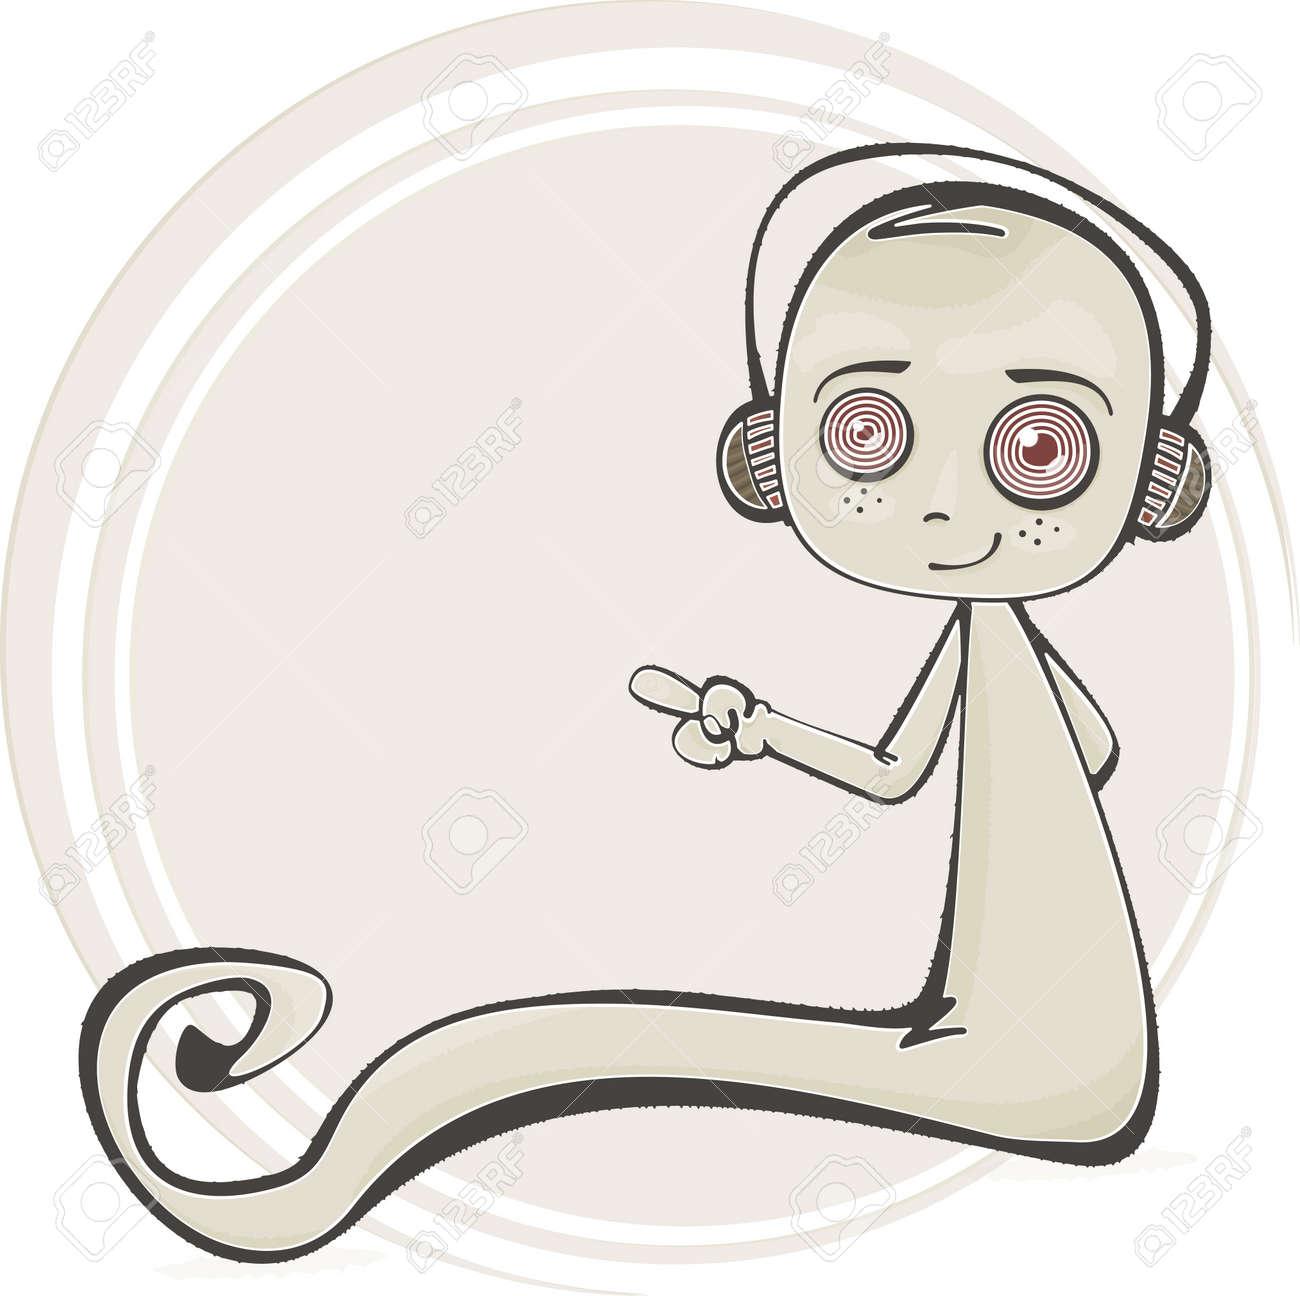 Cartoon illustration of a cute ghost Stock Vector - 15733233